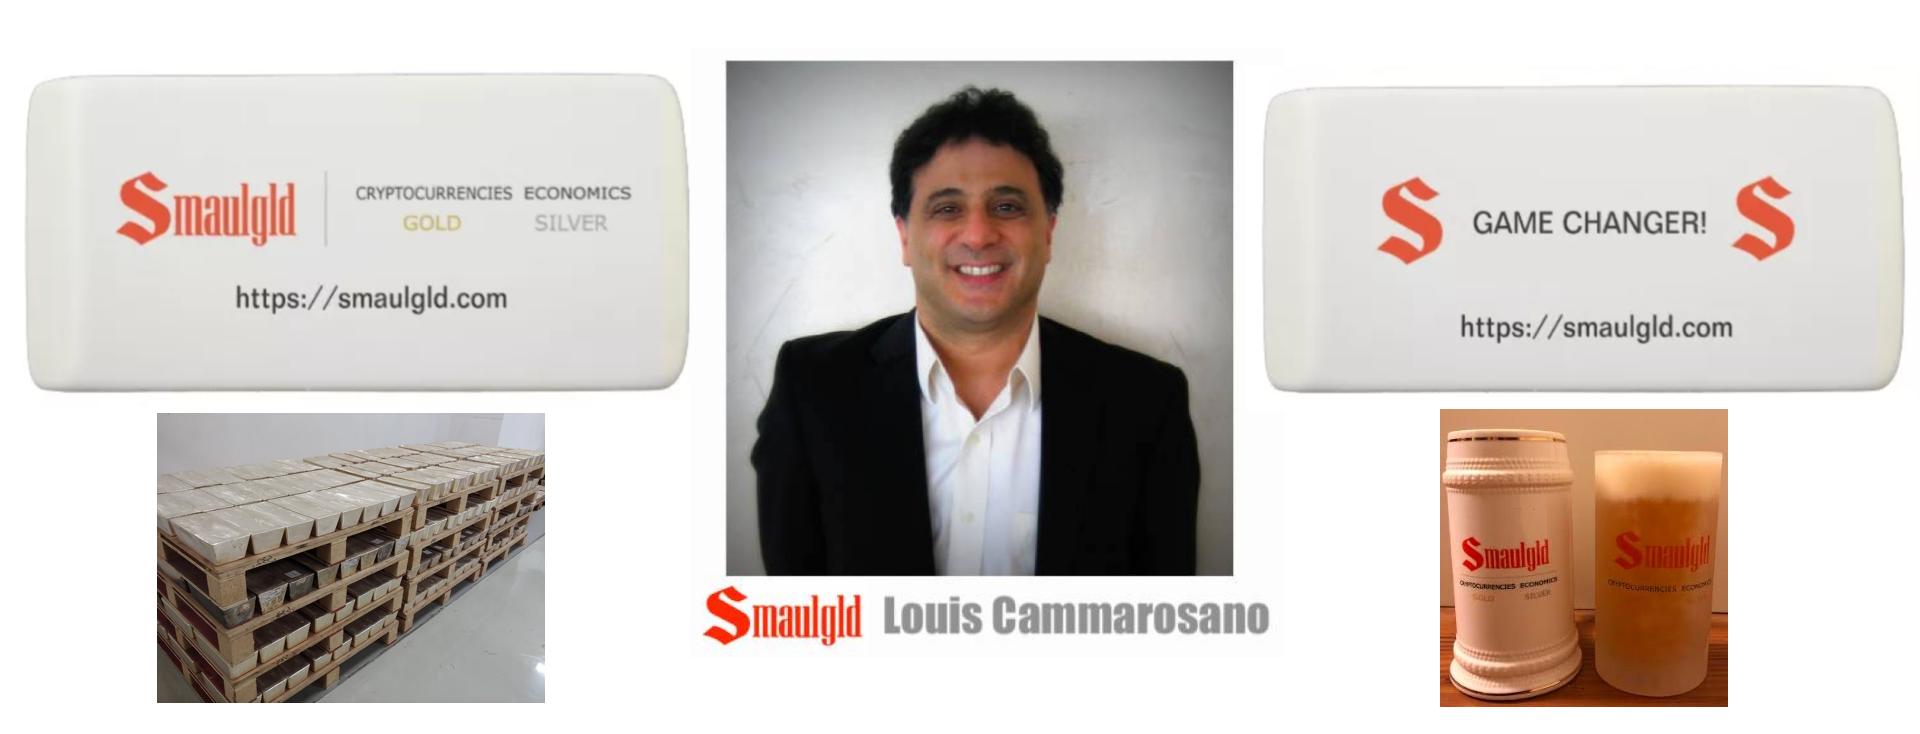 Gold Silver News Update SmaulGld.com Smaul Gld Louis Cammarosano Bullion Podcast